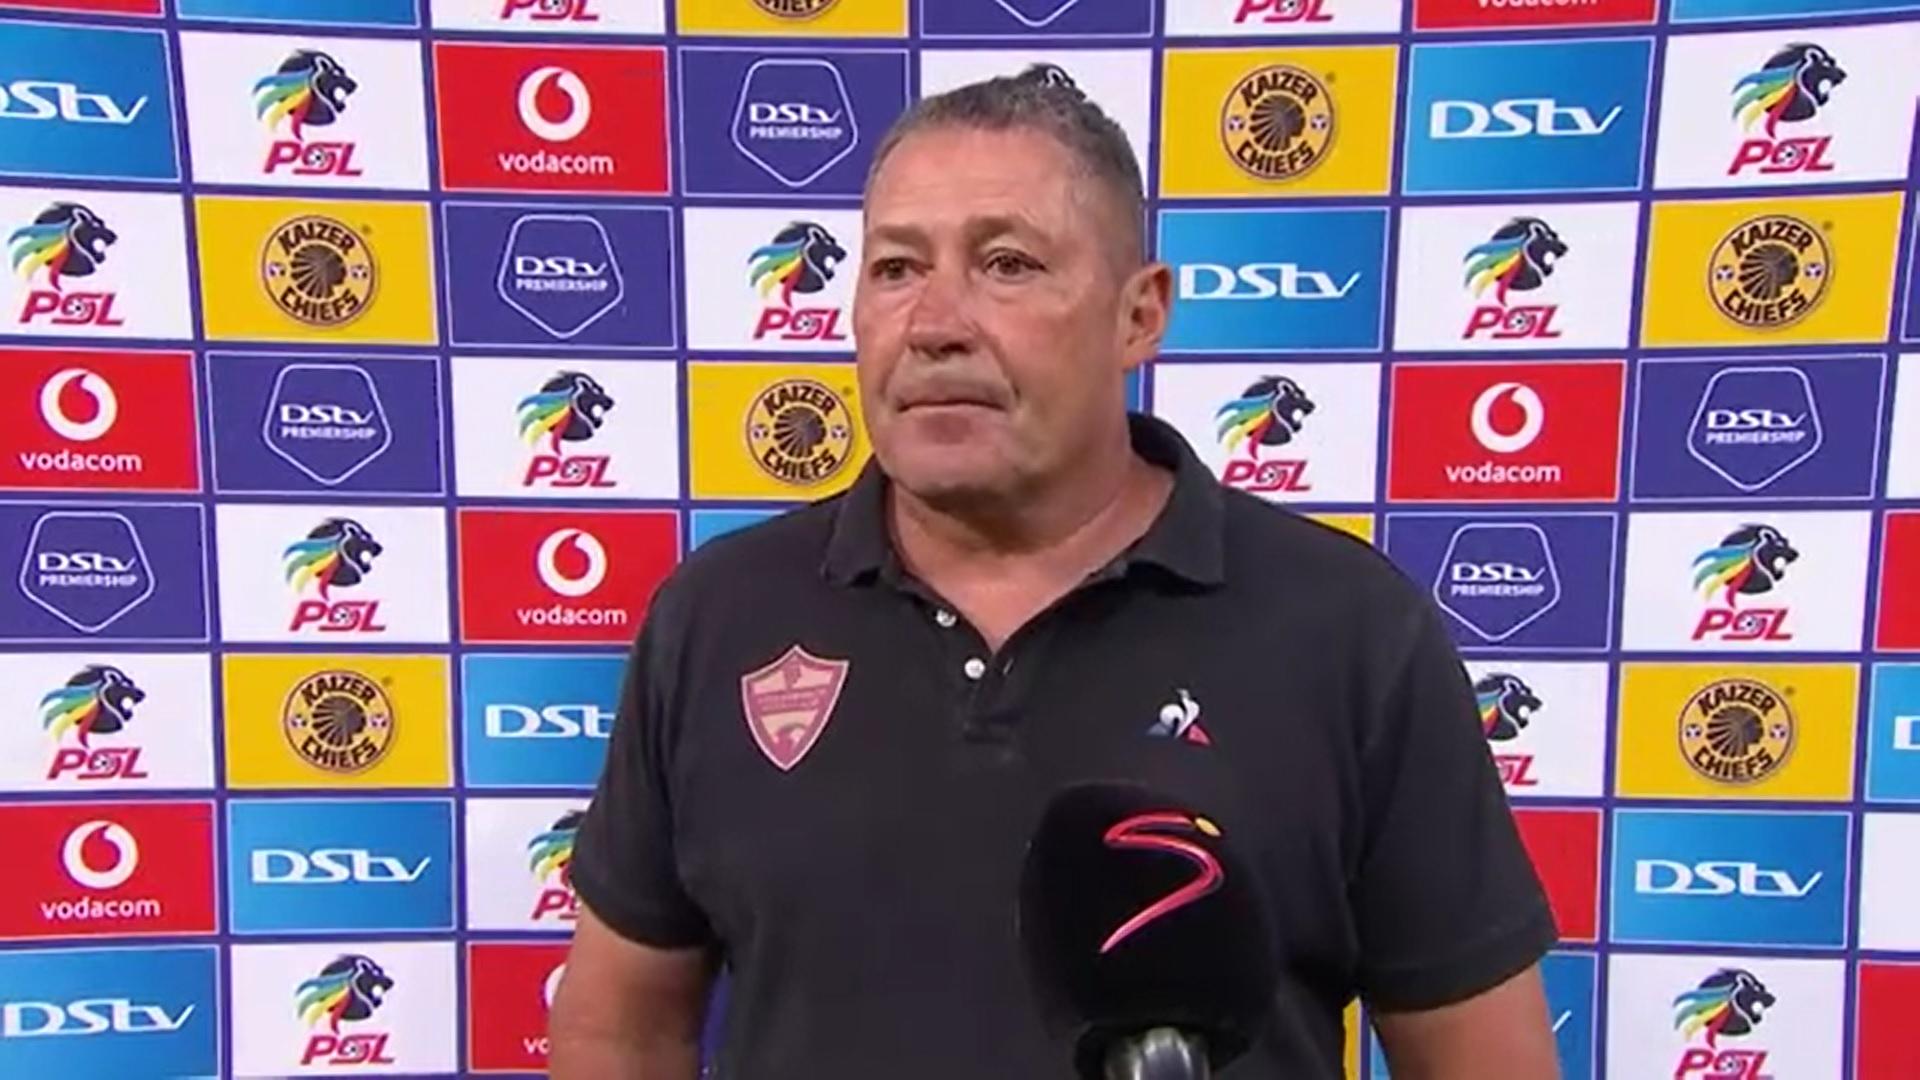 DStv Premiership I Kaizer Chiefs v Stellenbosch FC l Post-match interview with Steve Barker